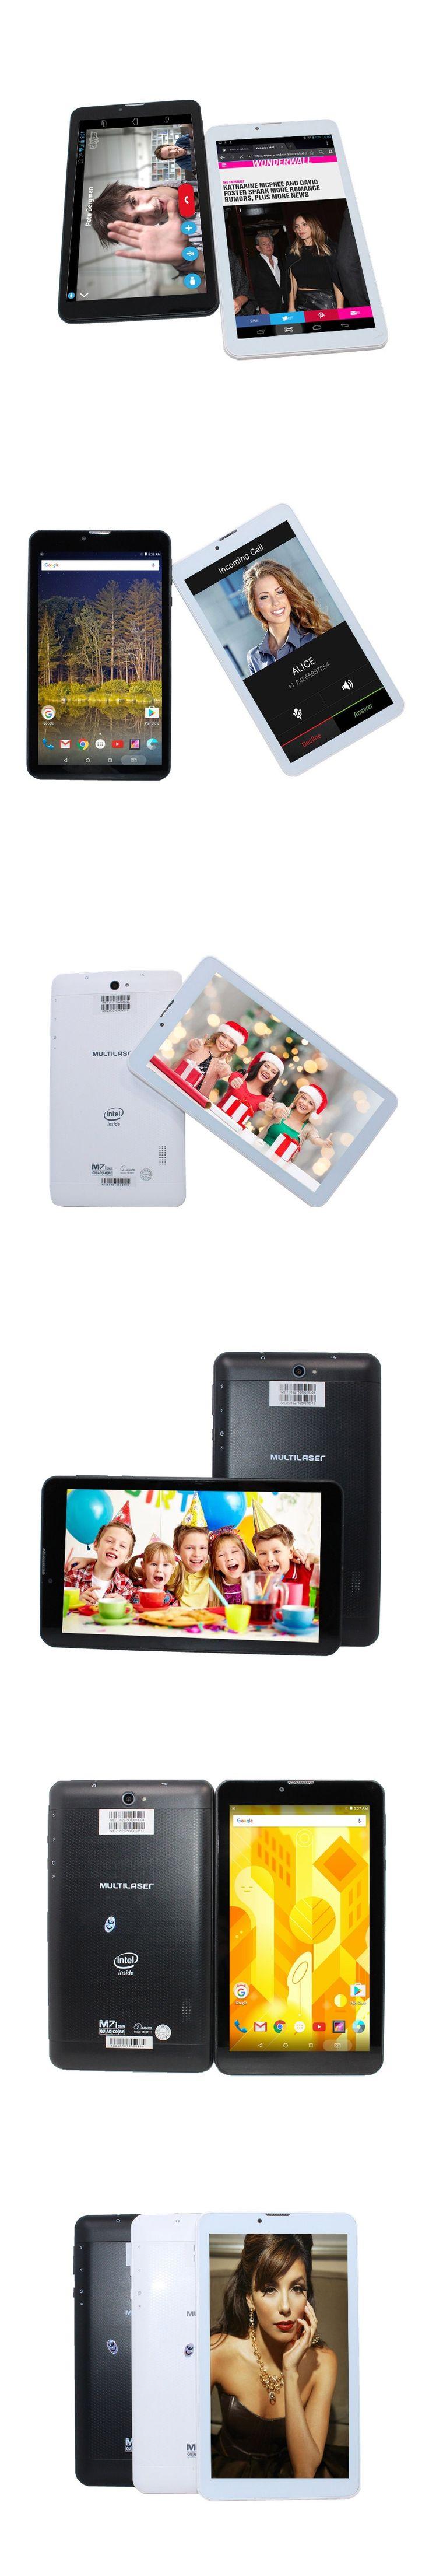 SALE 7 inch 3G phone call M7I 3G Android 6.0 Quad Core dual SIM Card Dual cameras Wifi 1024*600 1GB/8GB NEW